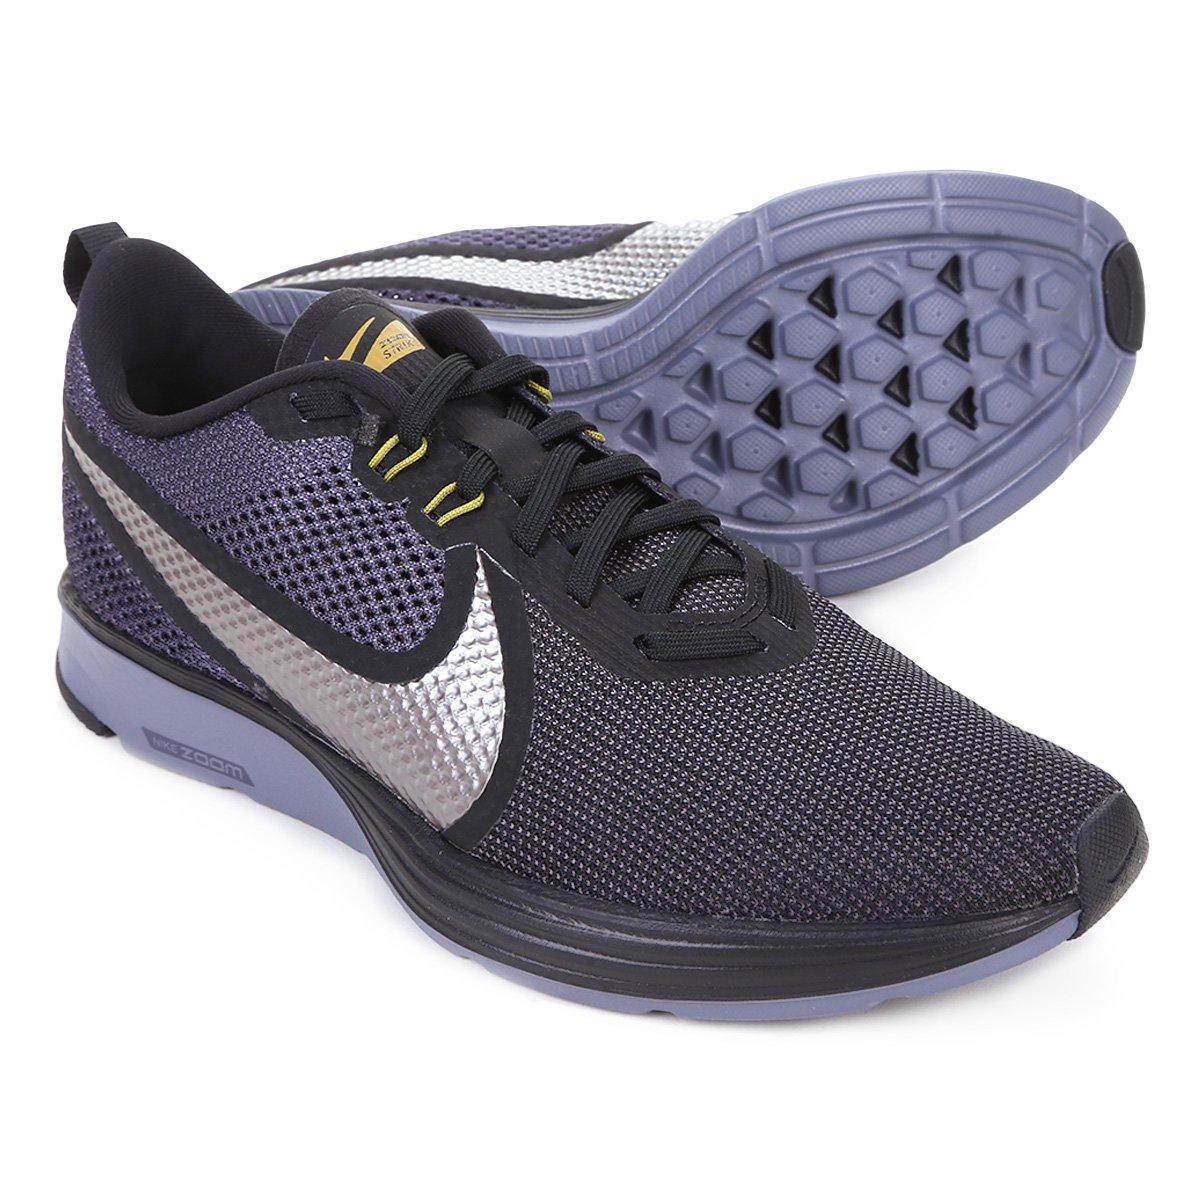 finest selection d1ffa 733f5 Tênis Nike Zoom Strike 2 Masculino - Preto e Prata - Compre Agora   Loja do  Inter